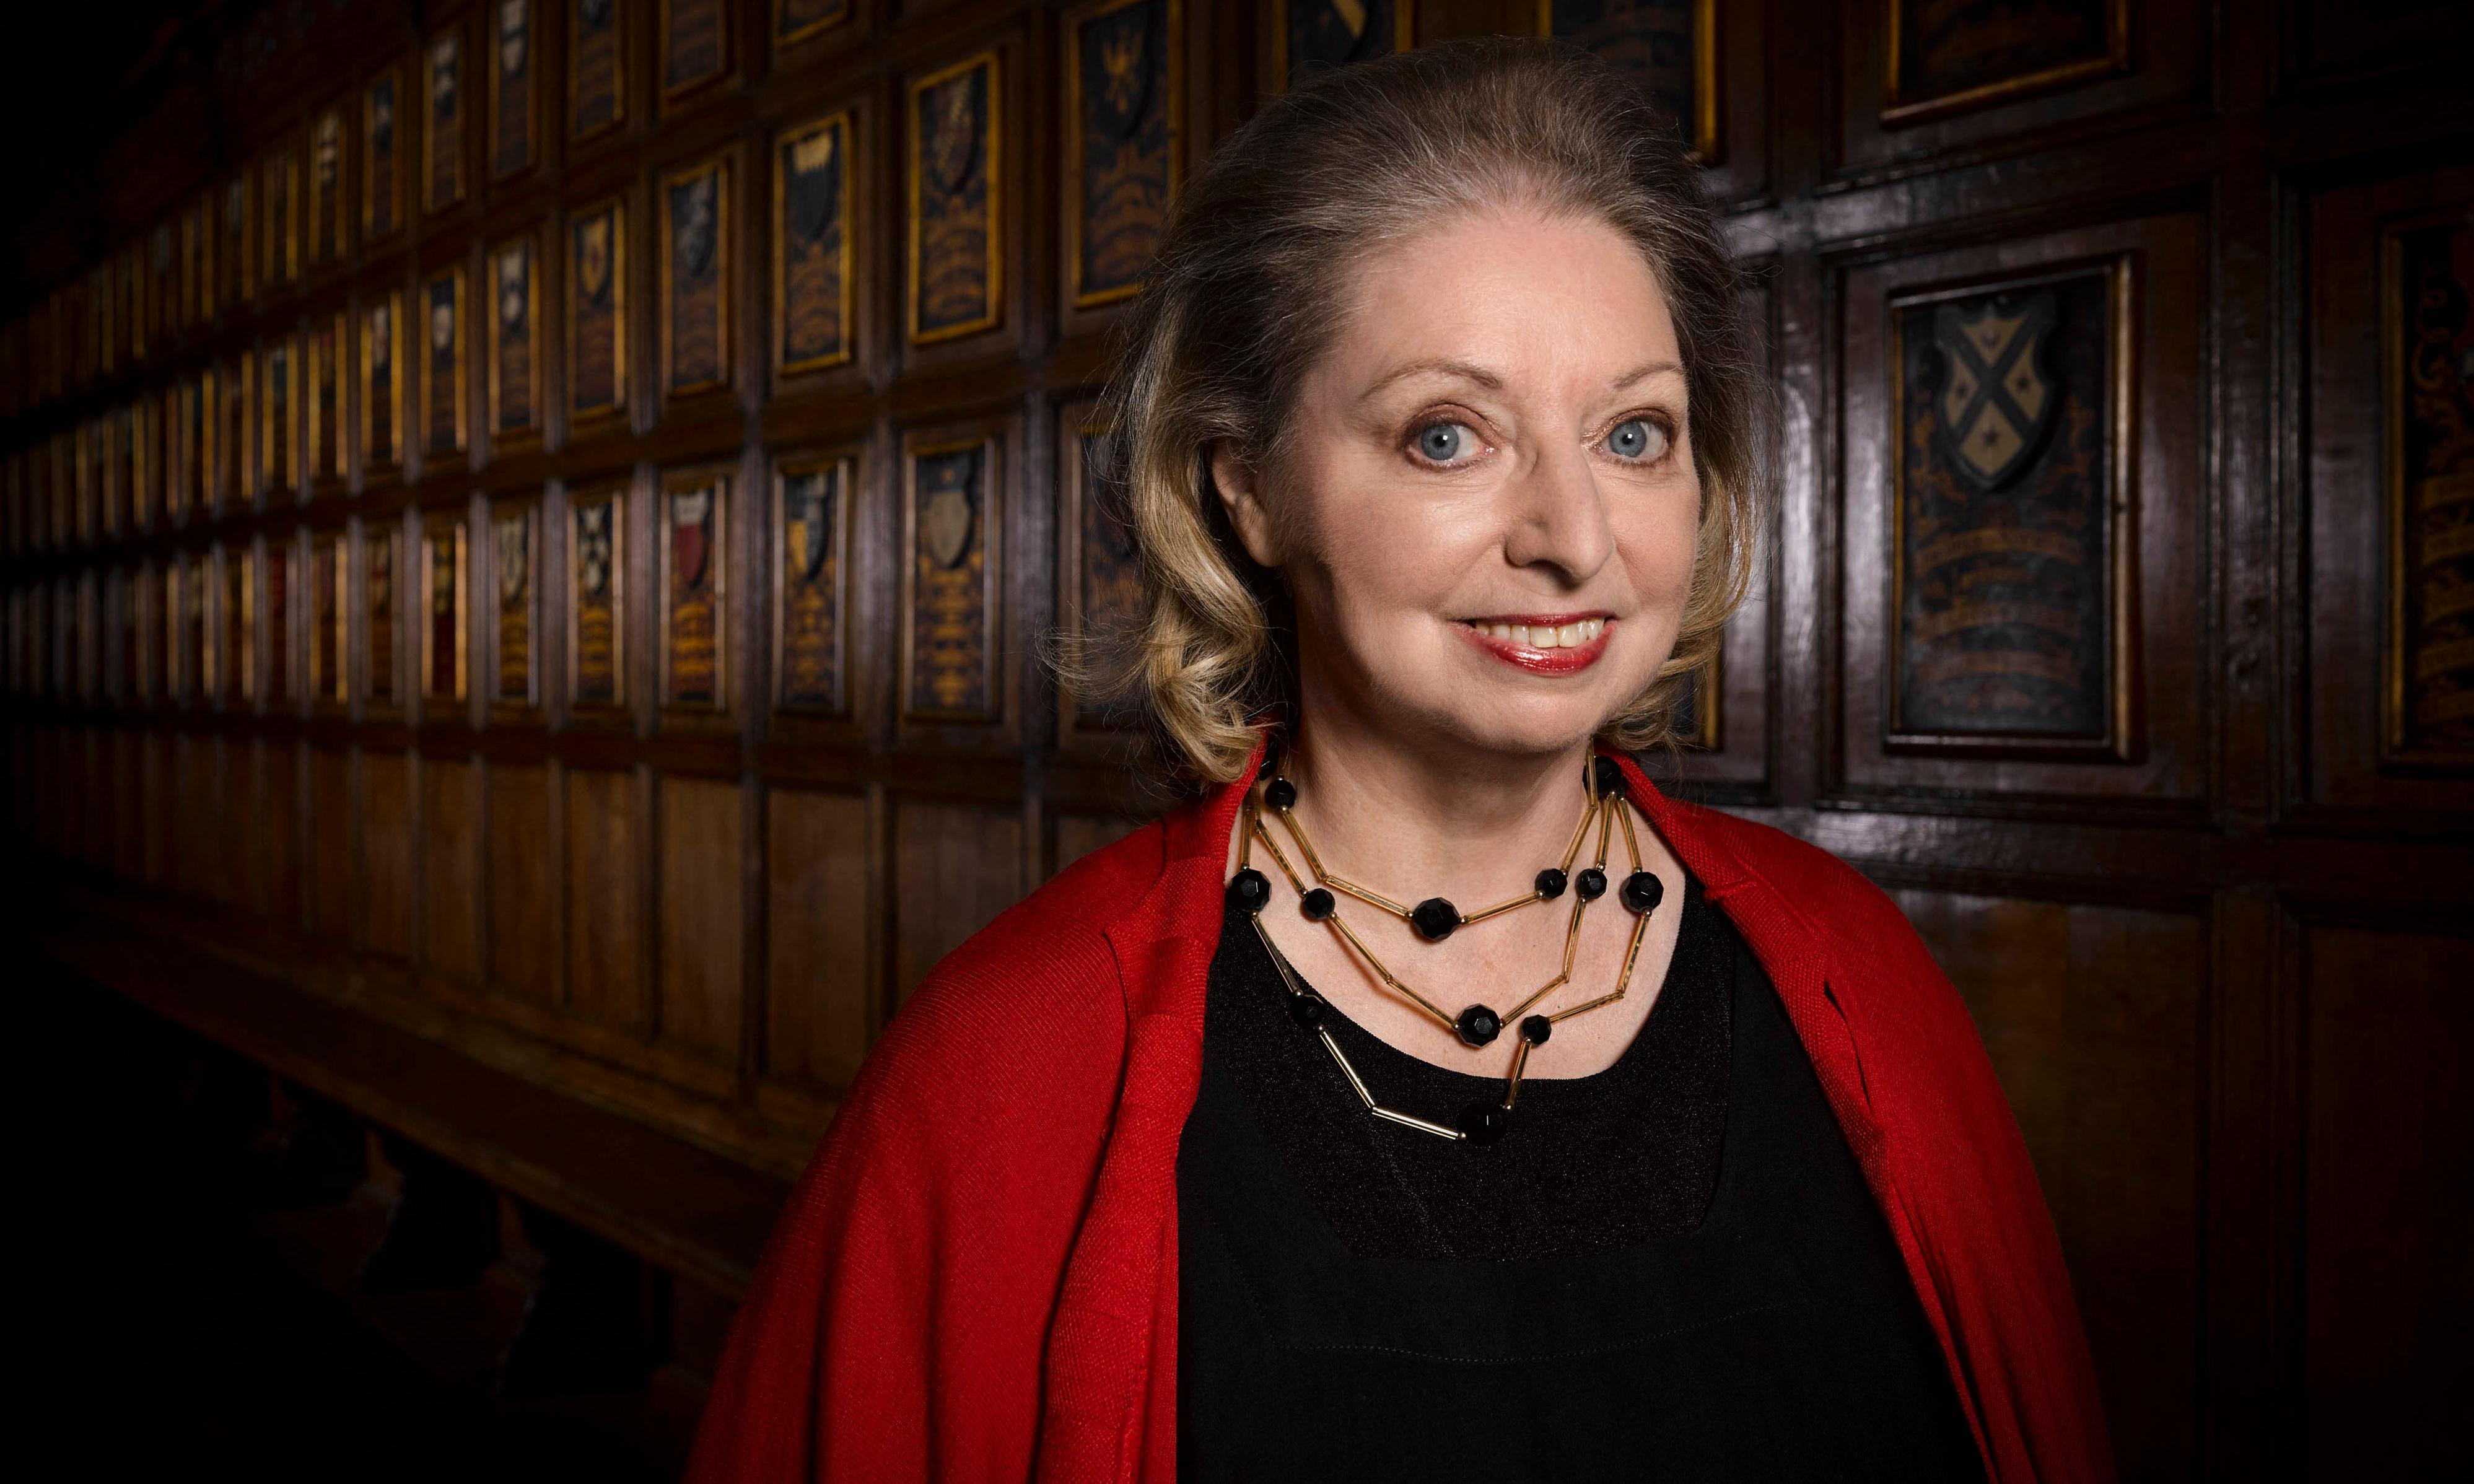 Tudor fat: long books like Hilary Mantel's don't need to be hard